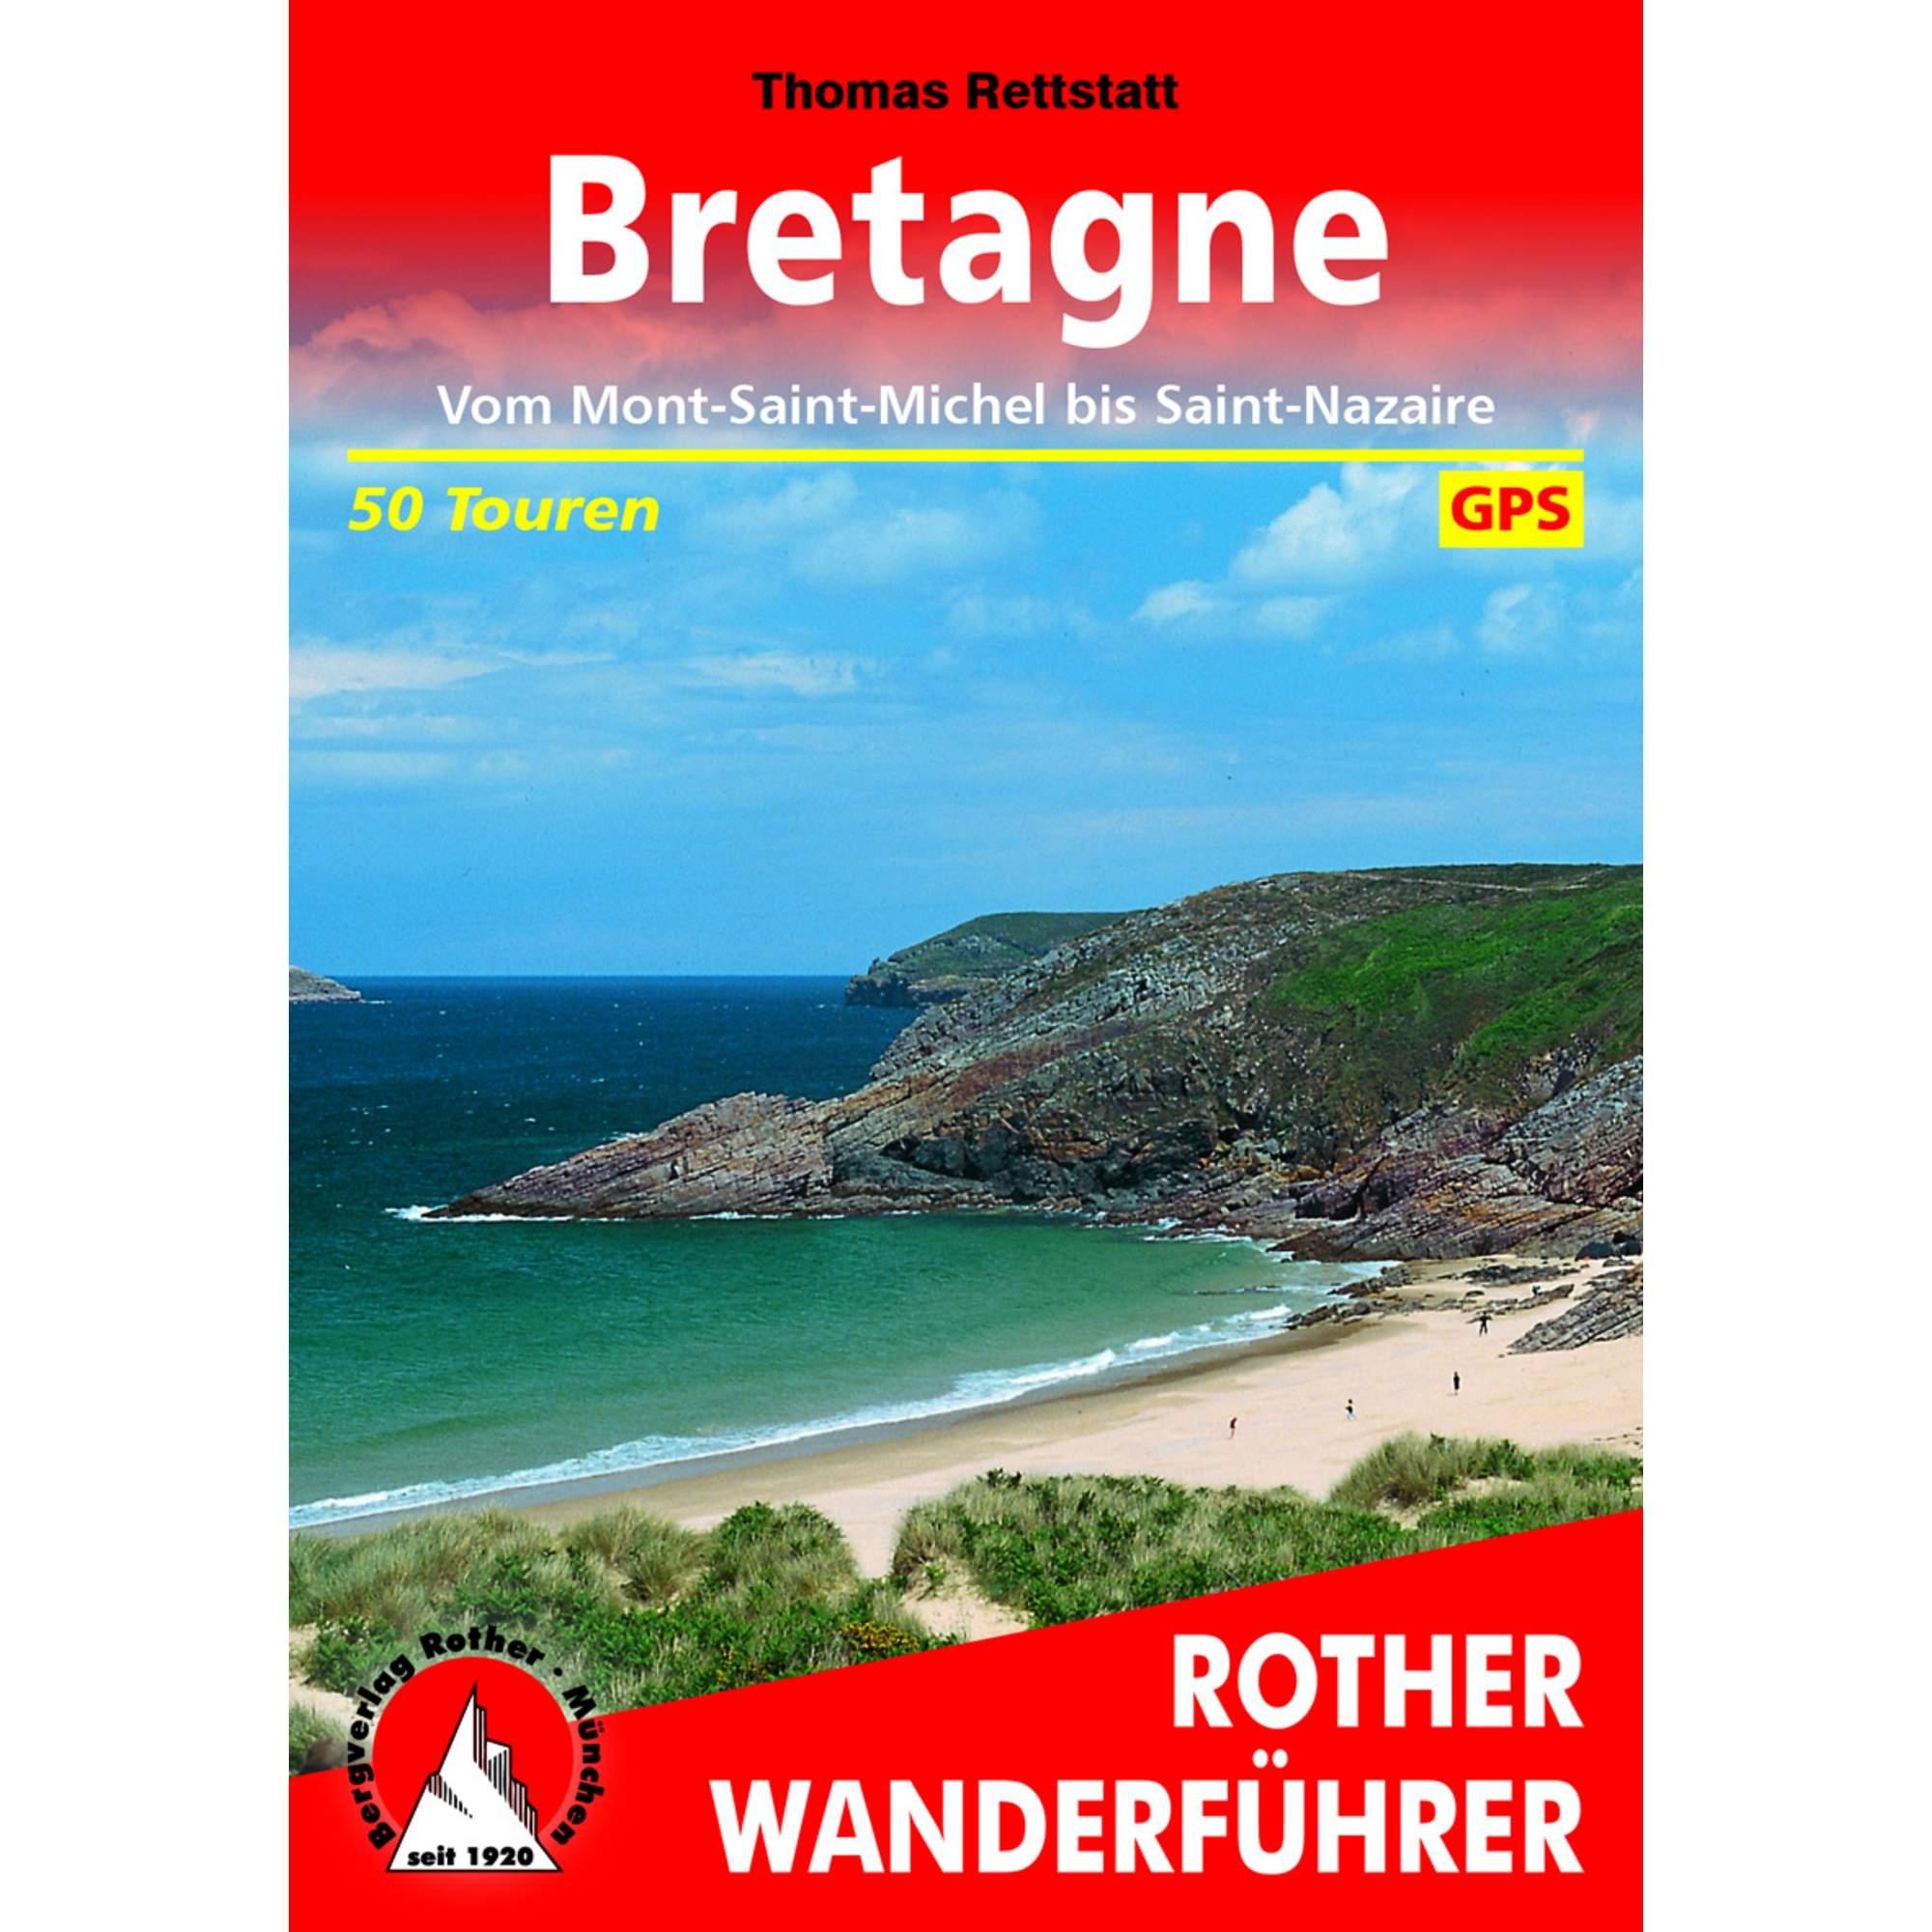 BVR BRETAGNE, 14,90 Euro